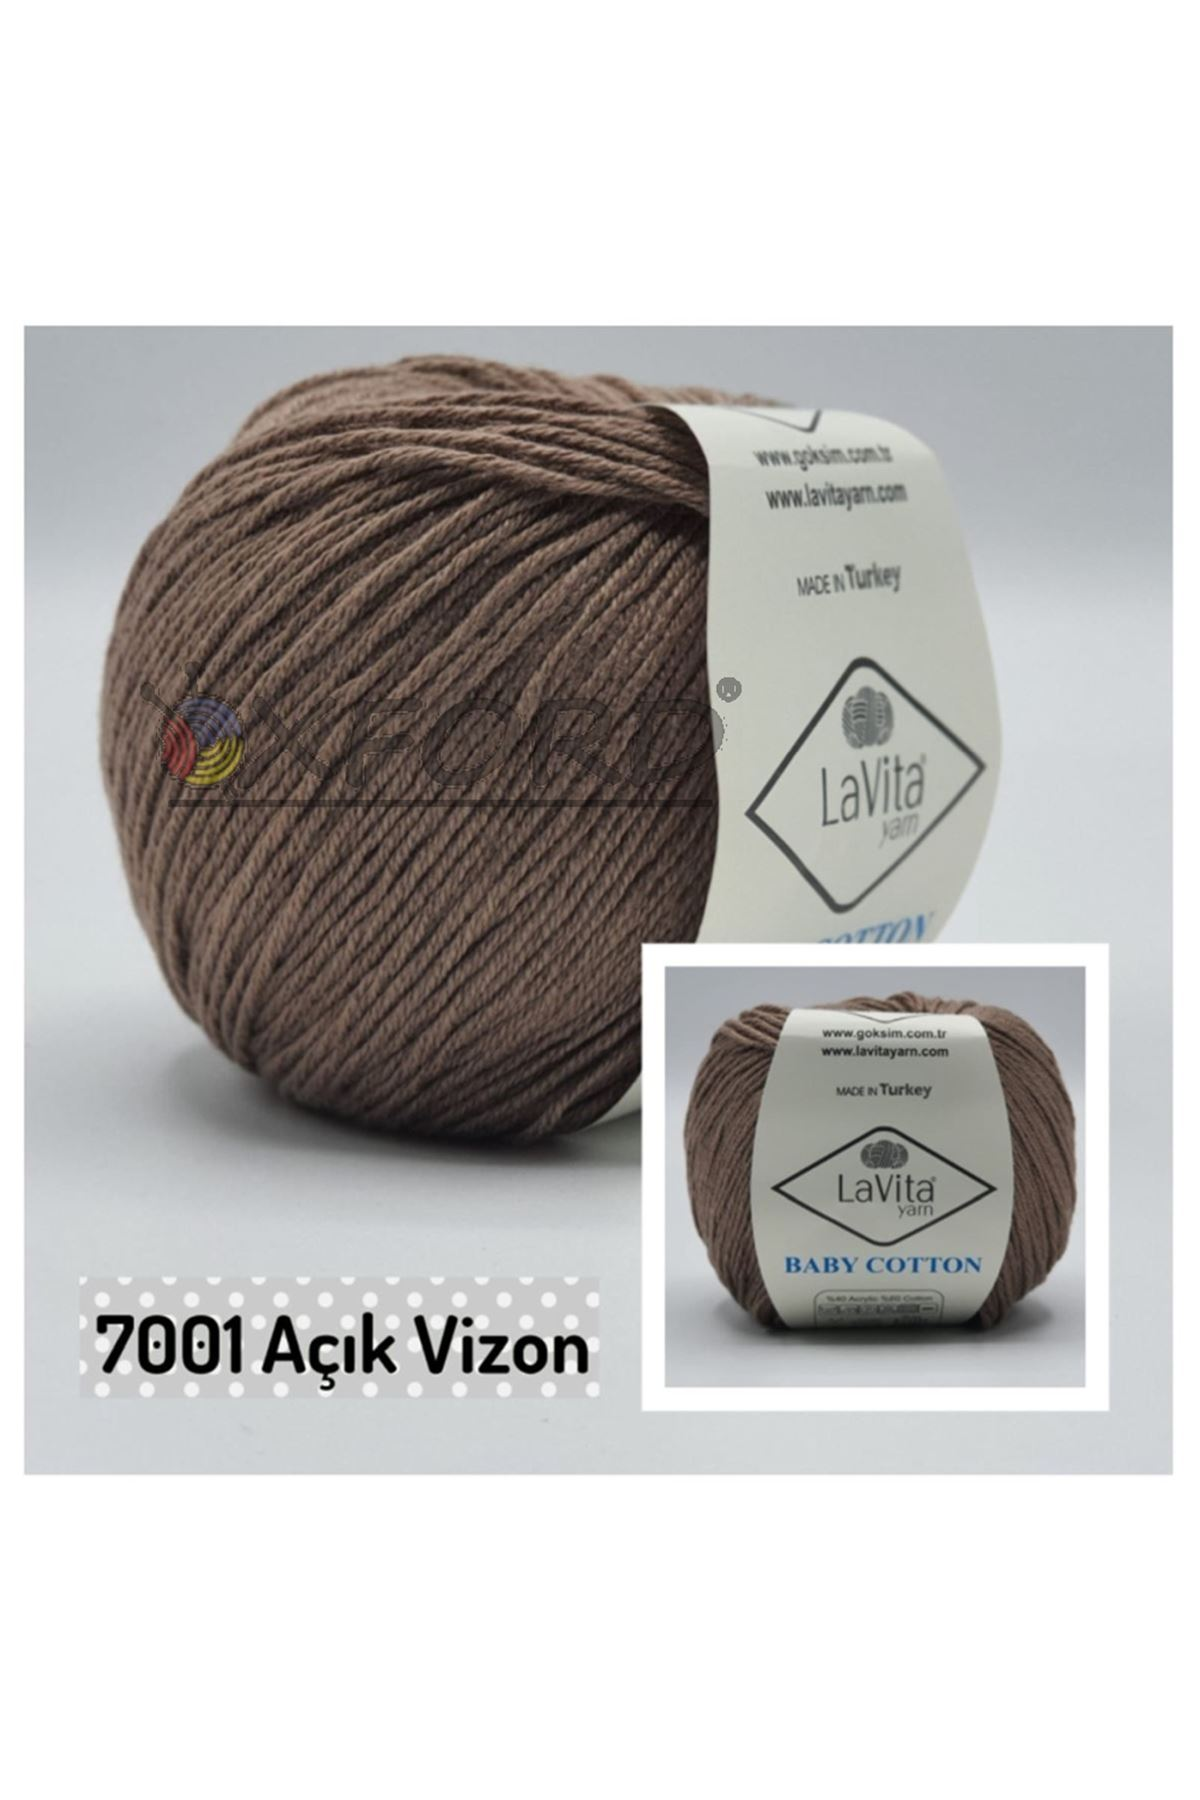 Lavita Baby Cotton 7001 Açık Vizon